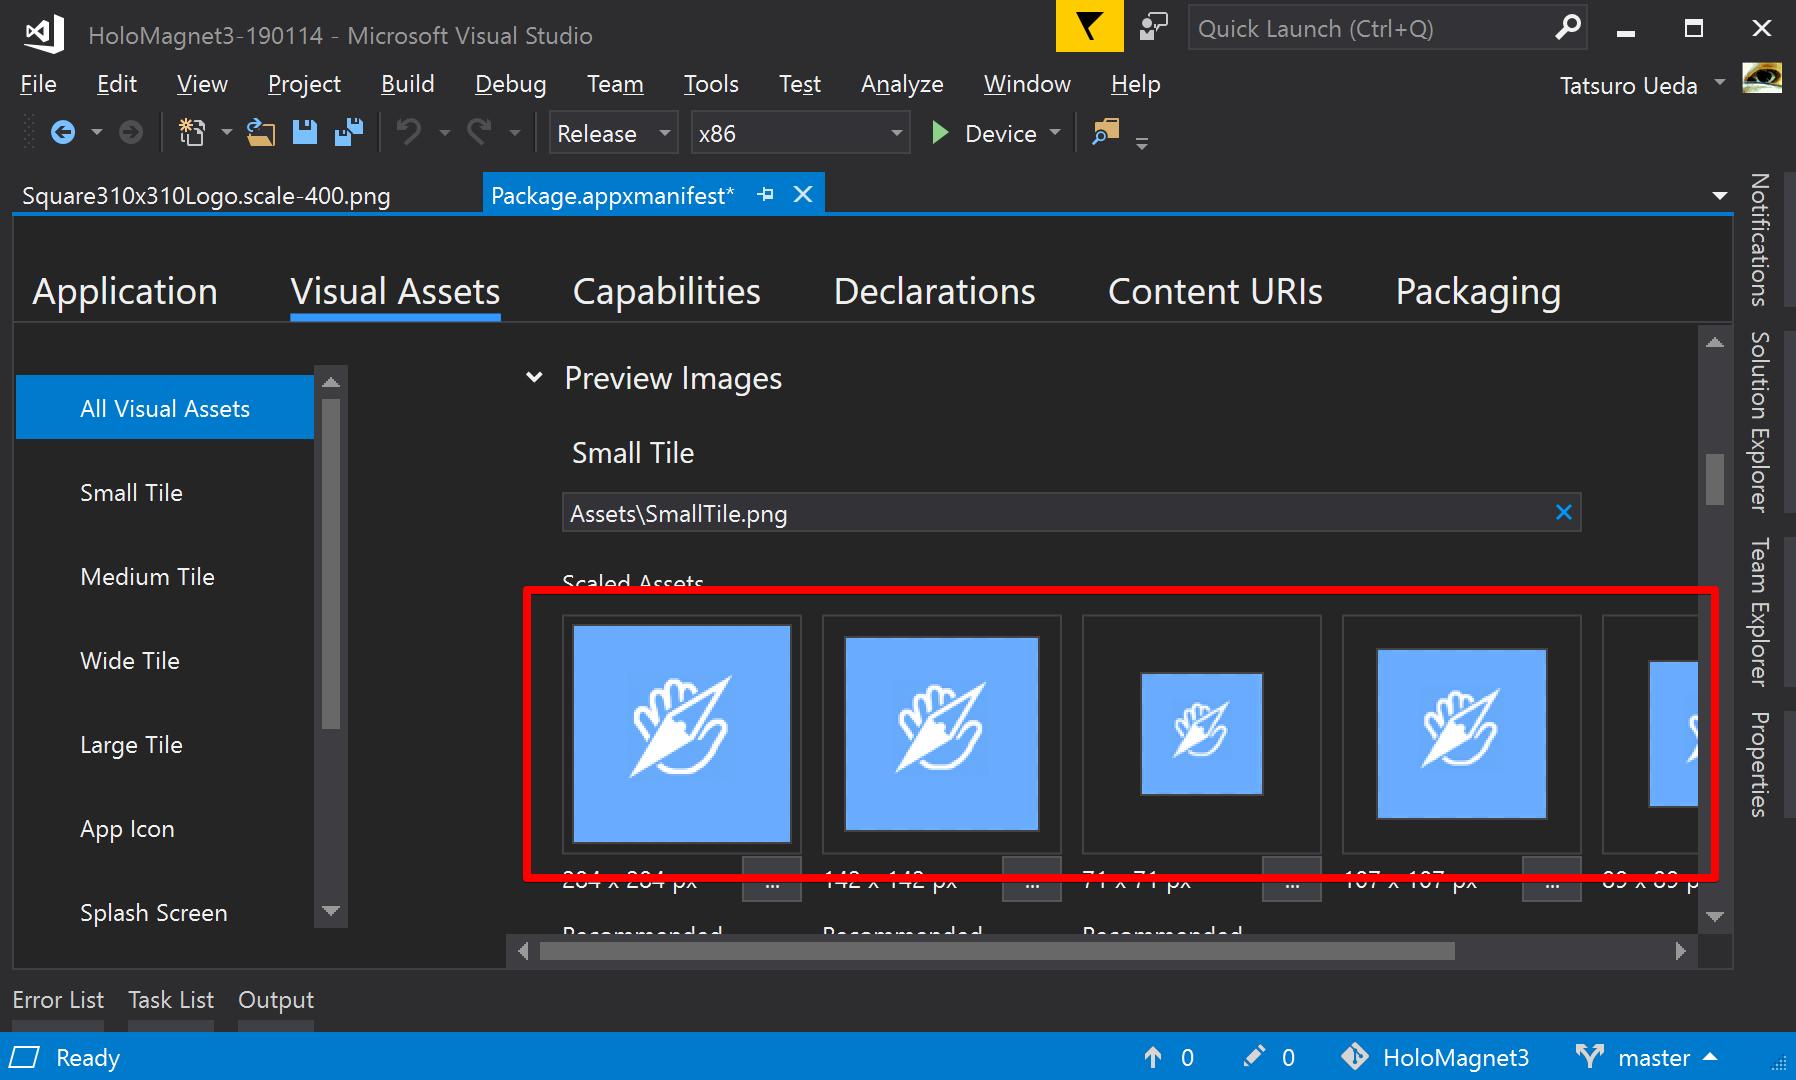 HoloMagnet3-190114 - Microsoft Visual Studio 2019-05-20 11 00 48